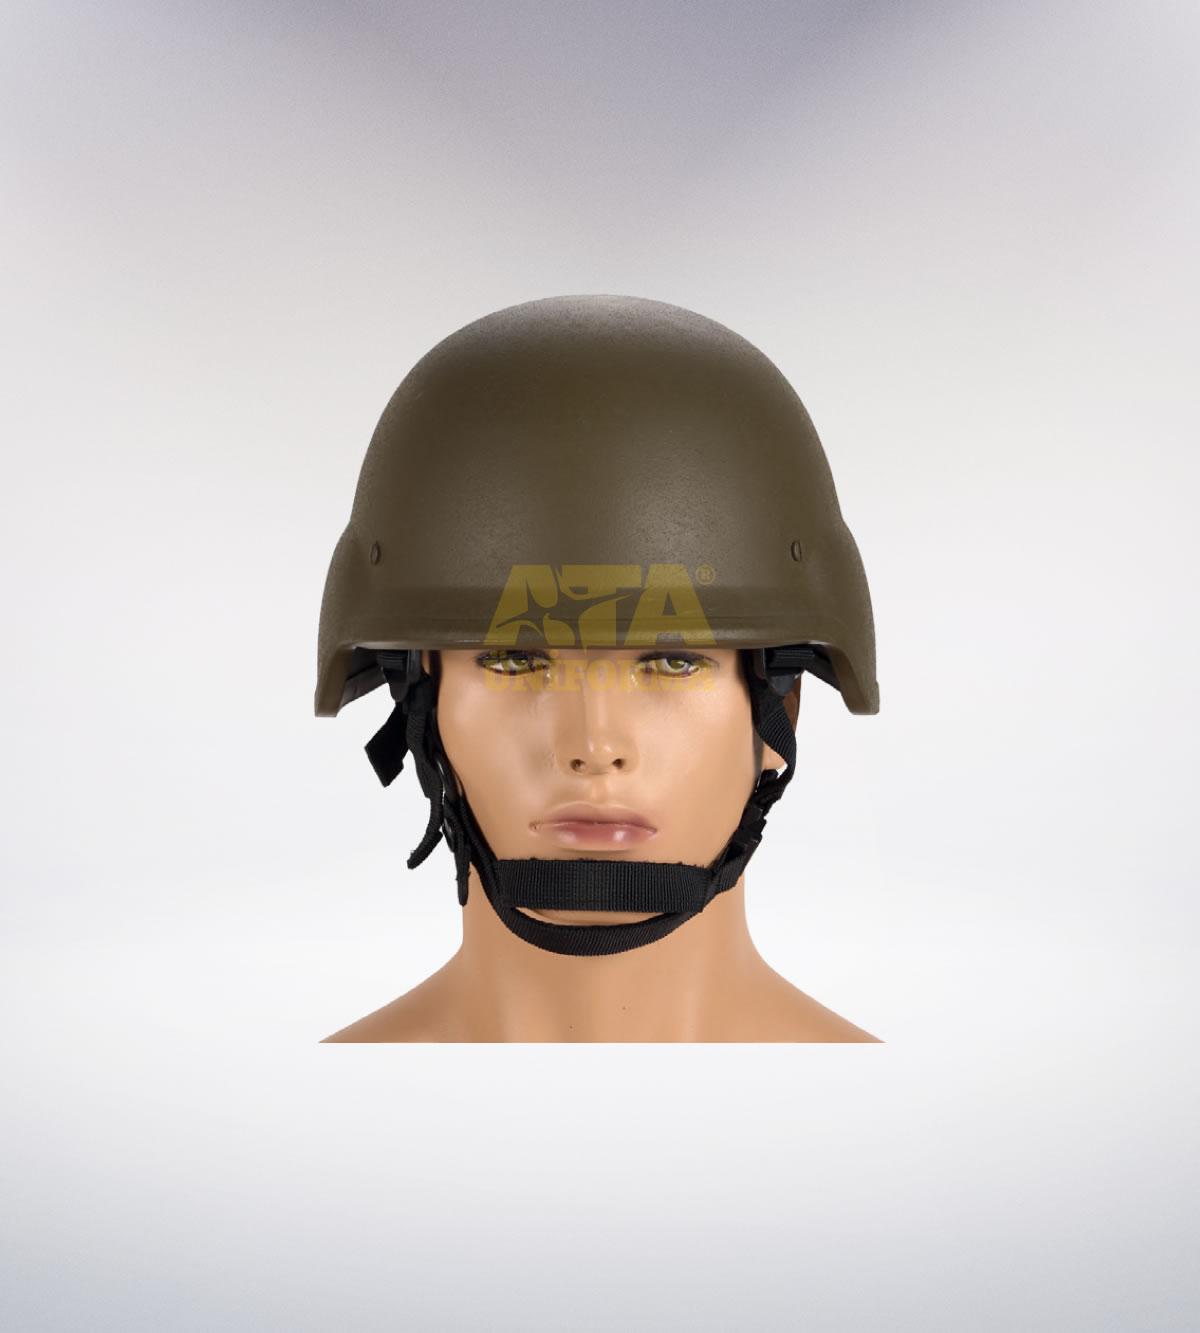 ATA-1120 Asker ve polis kask  - asker ve polis elbiseleri | asker ve polis üniformaları | asker ve polis kıyafetleri